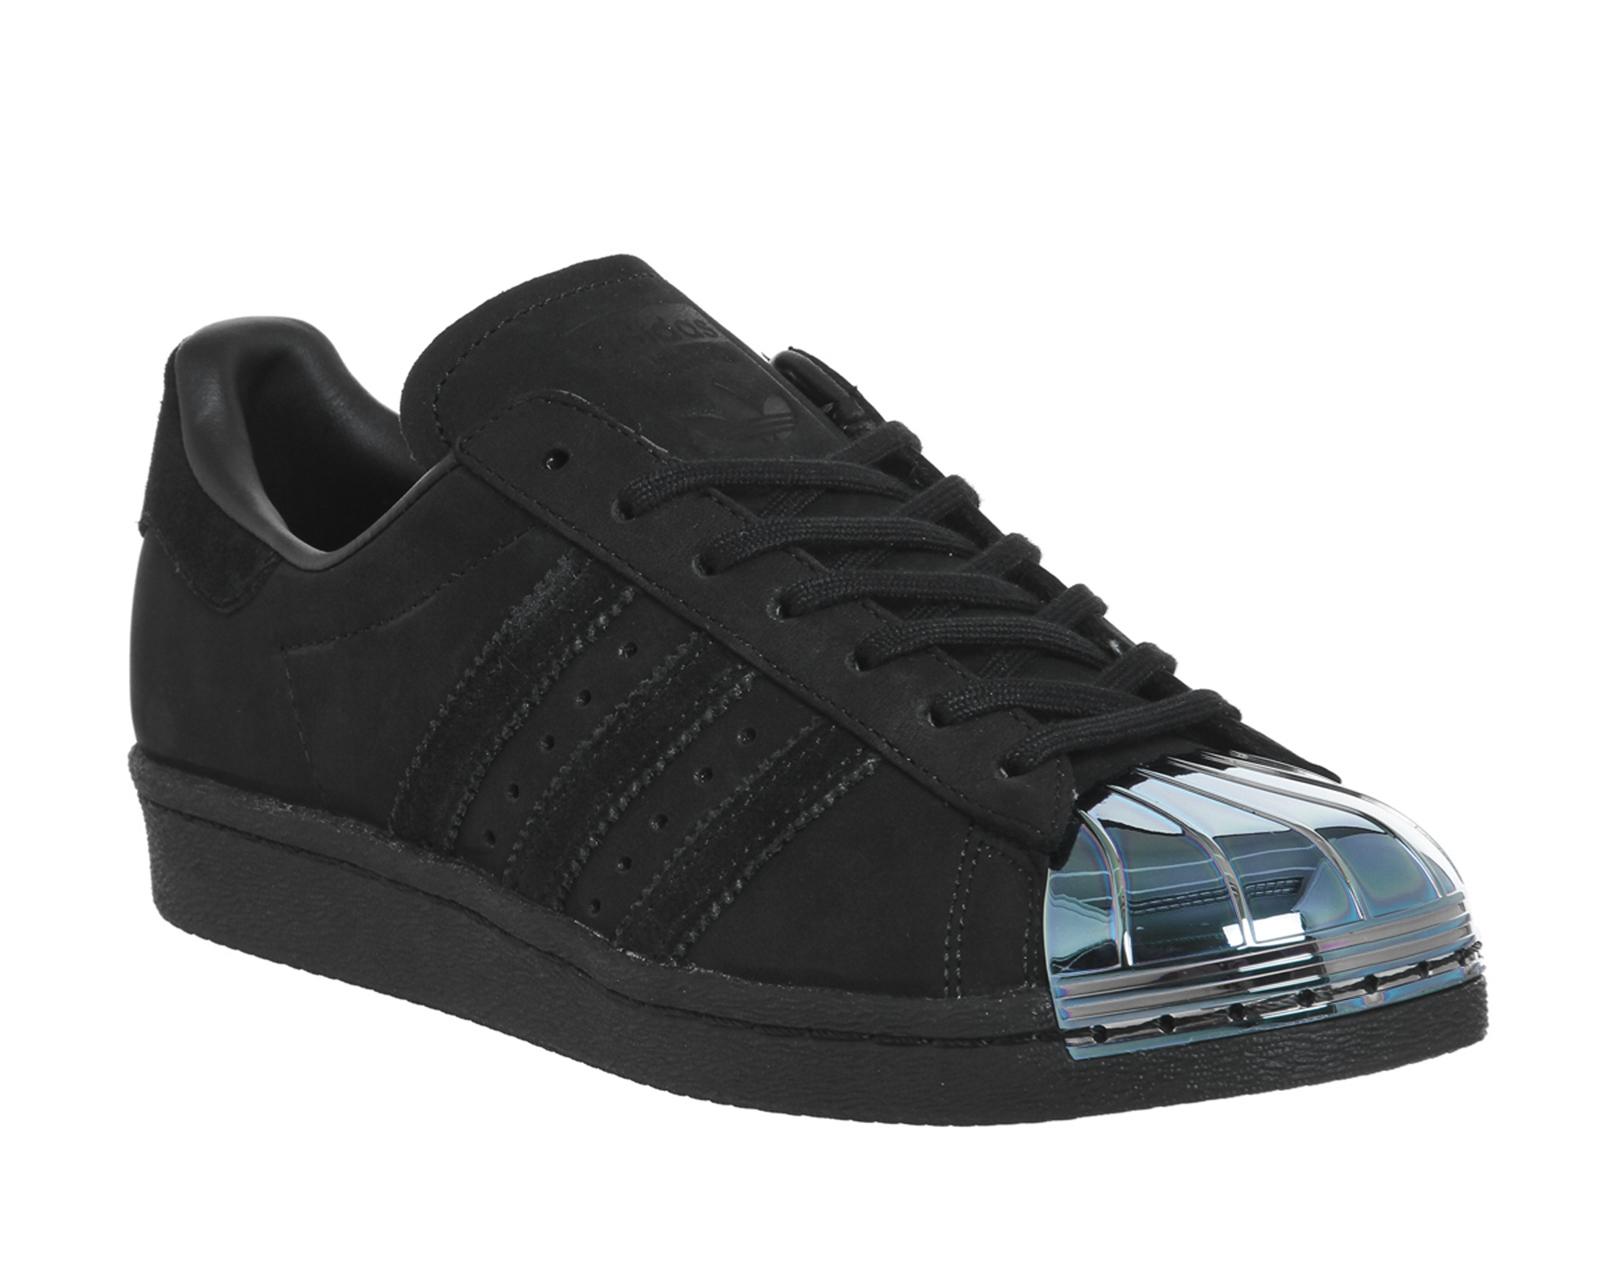 bd682ceda863e Womens Adidas Superstar 80 s Metal Toe Trainers BLACK PETROL ...